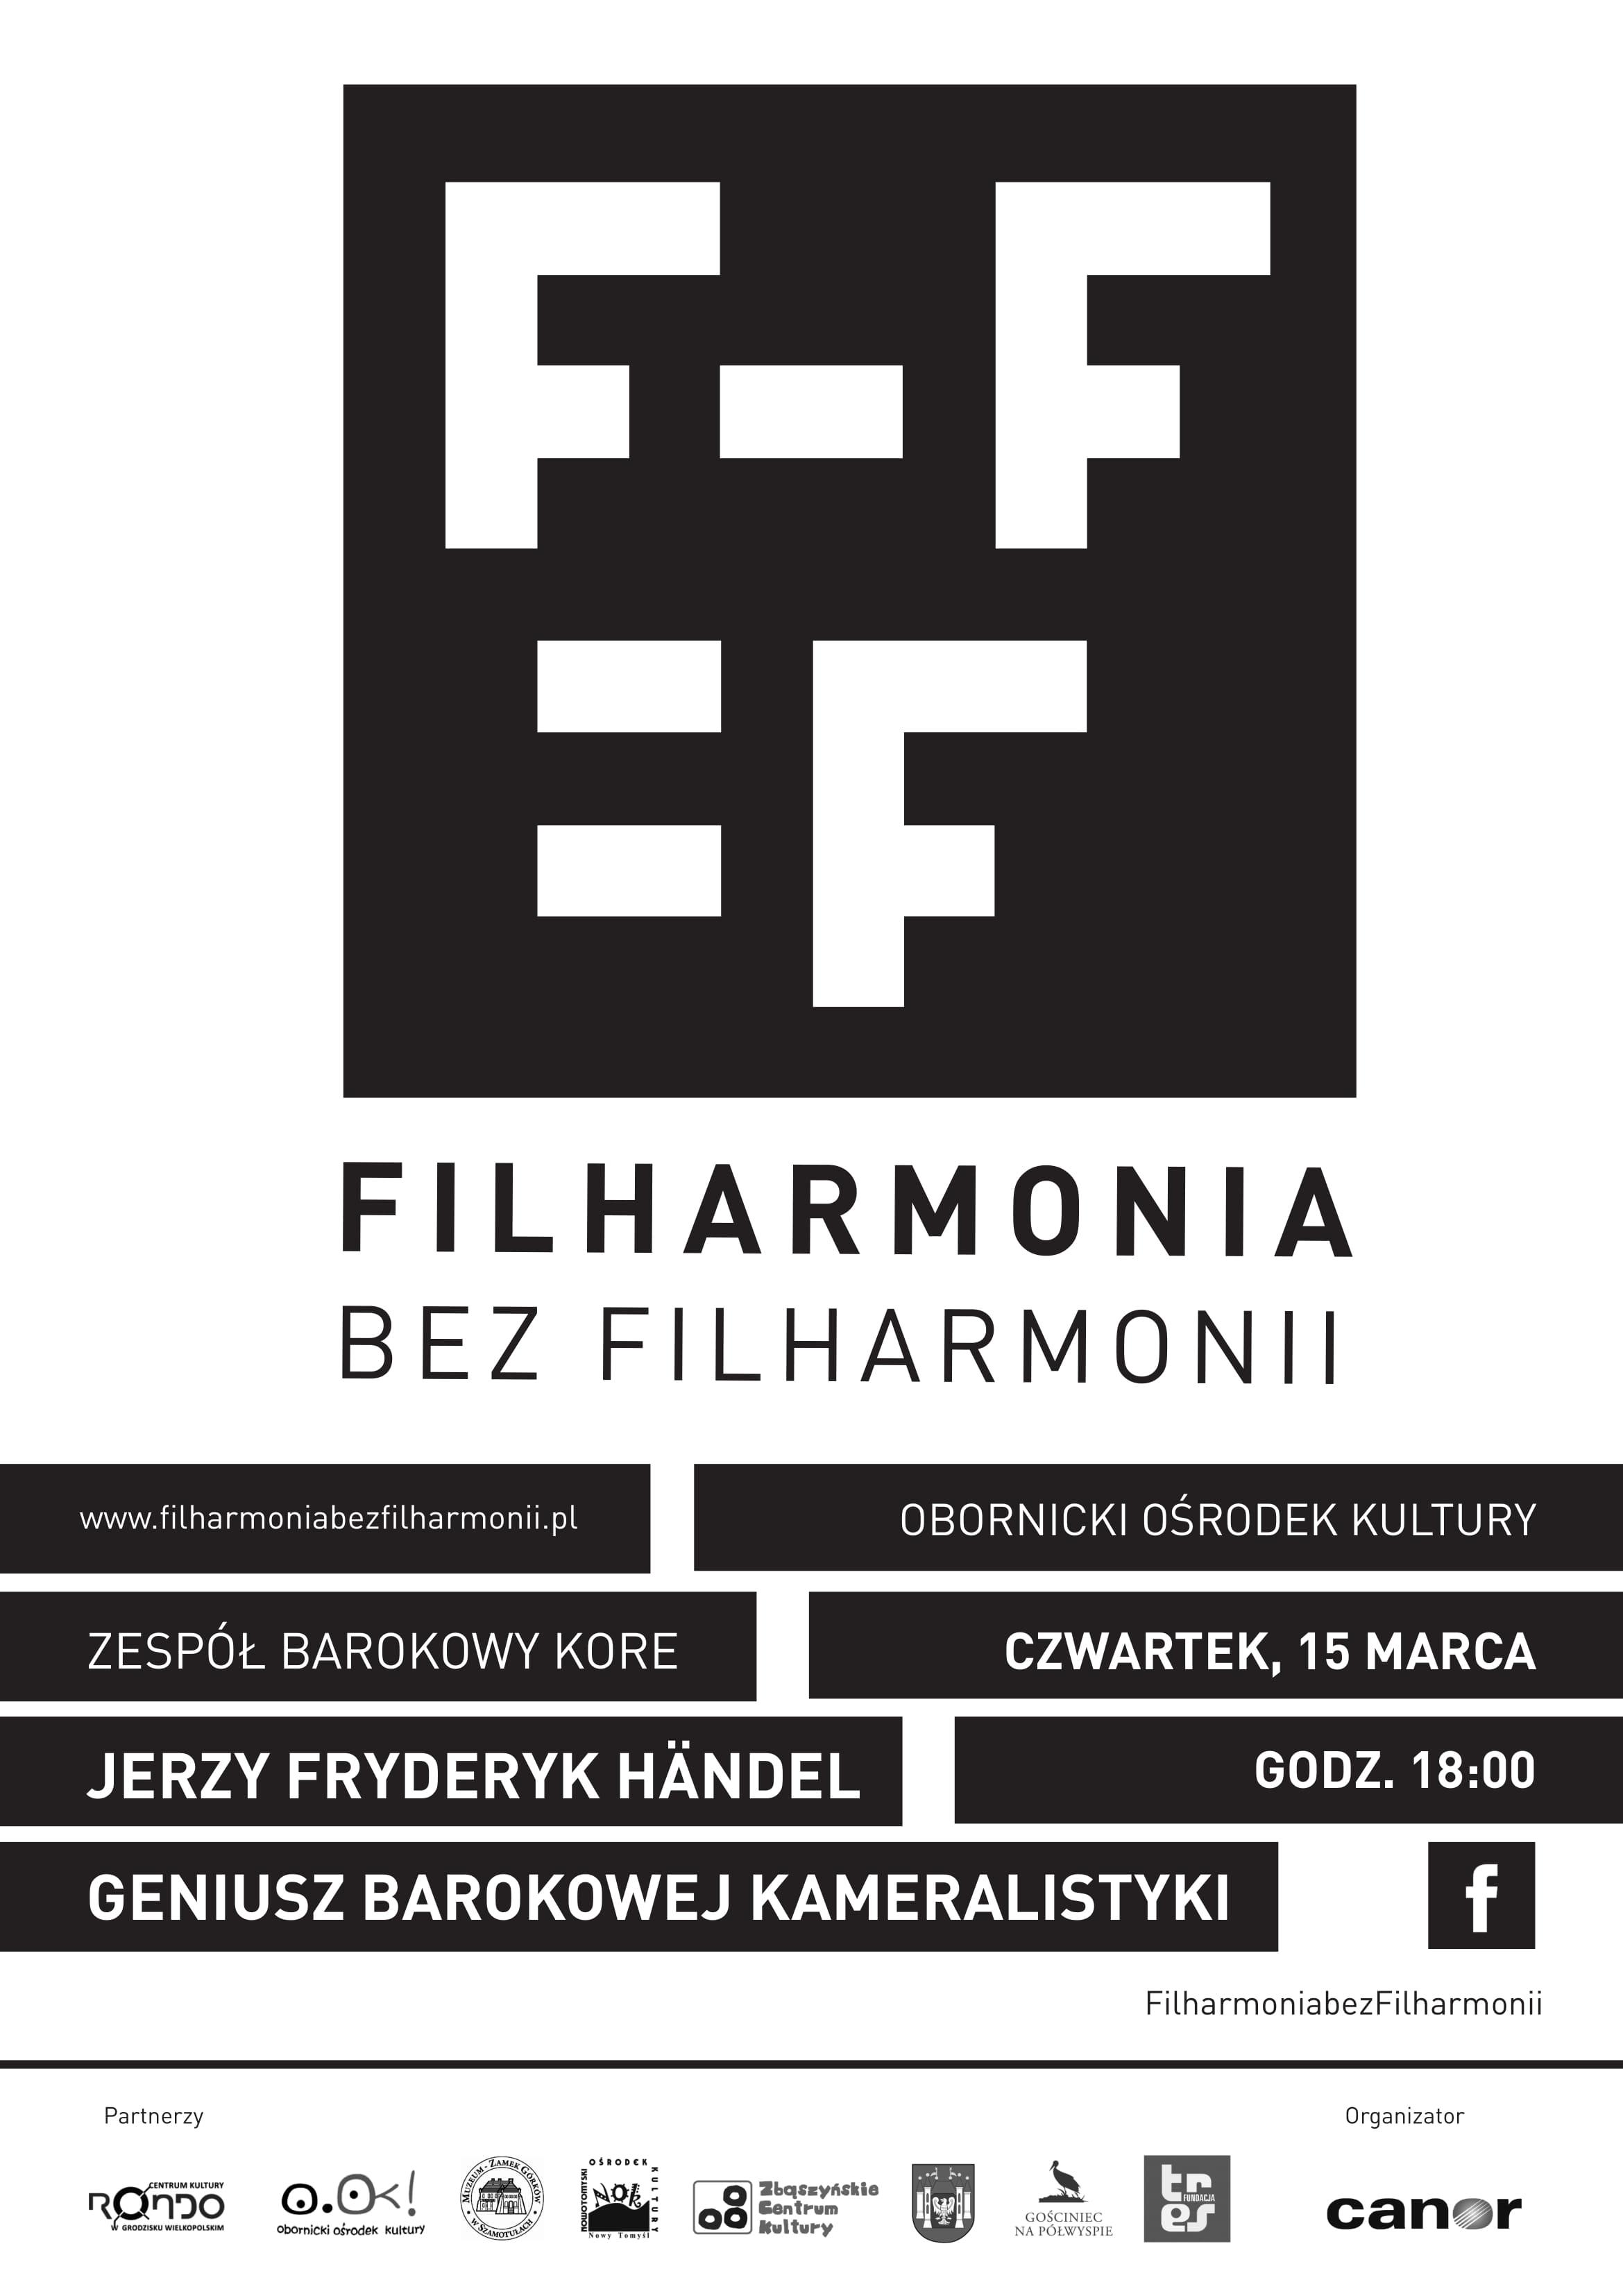 2018.03.15 Filharmonia bez filharmonii